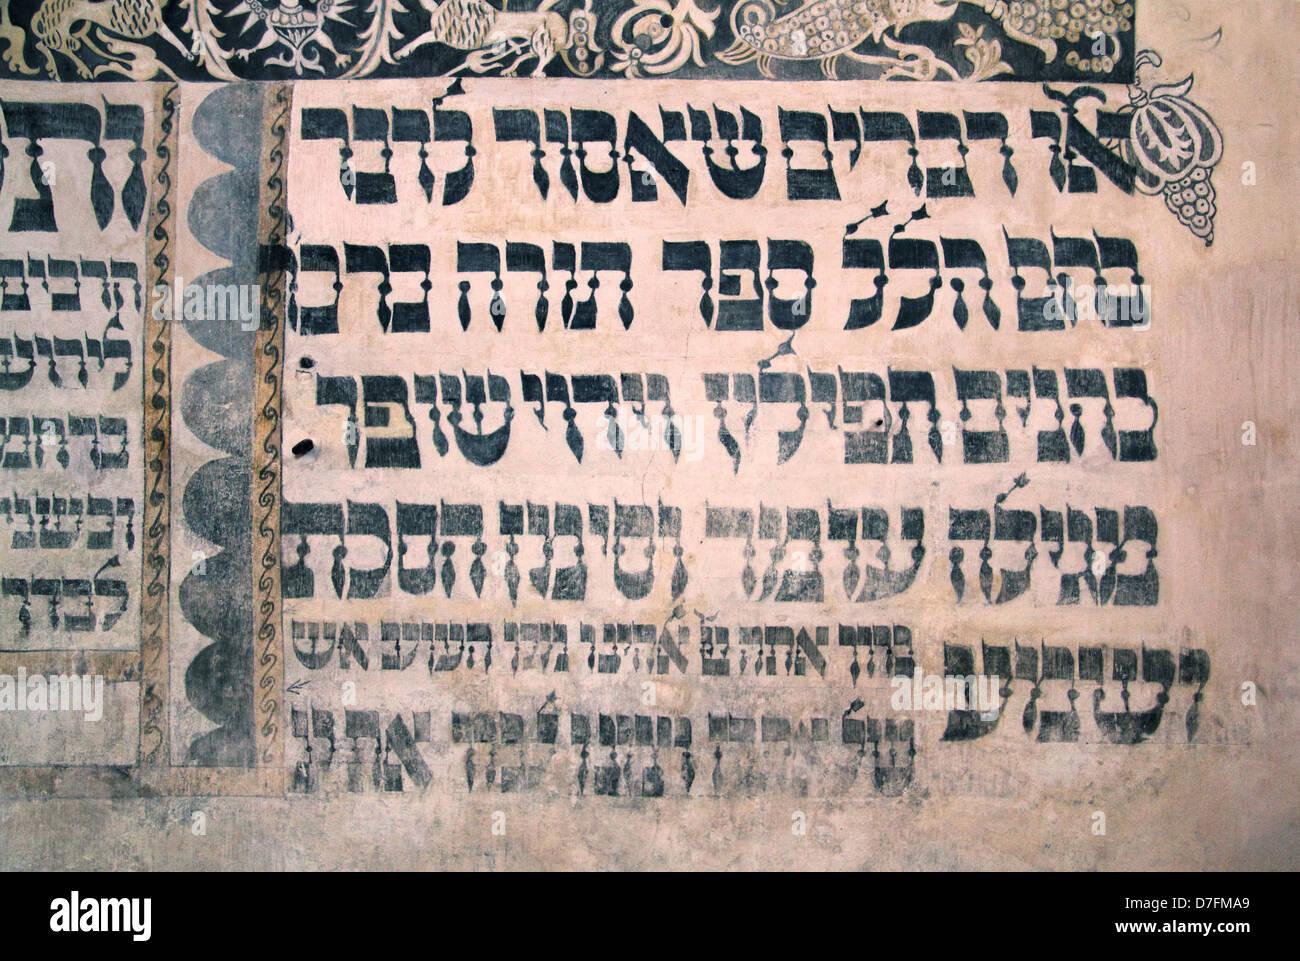 Biblical Prayer Hebrew text written on the interior walls of Tykocin (Tiktin) Synagogue, Poland - Stock Image